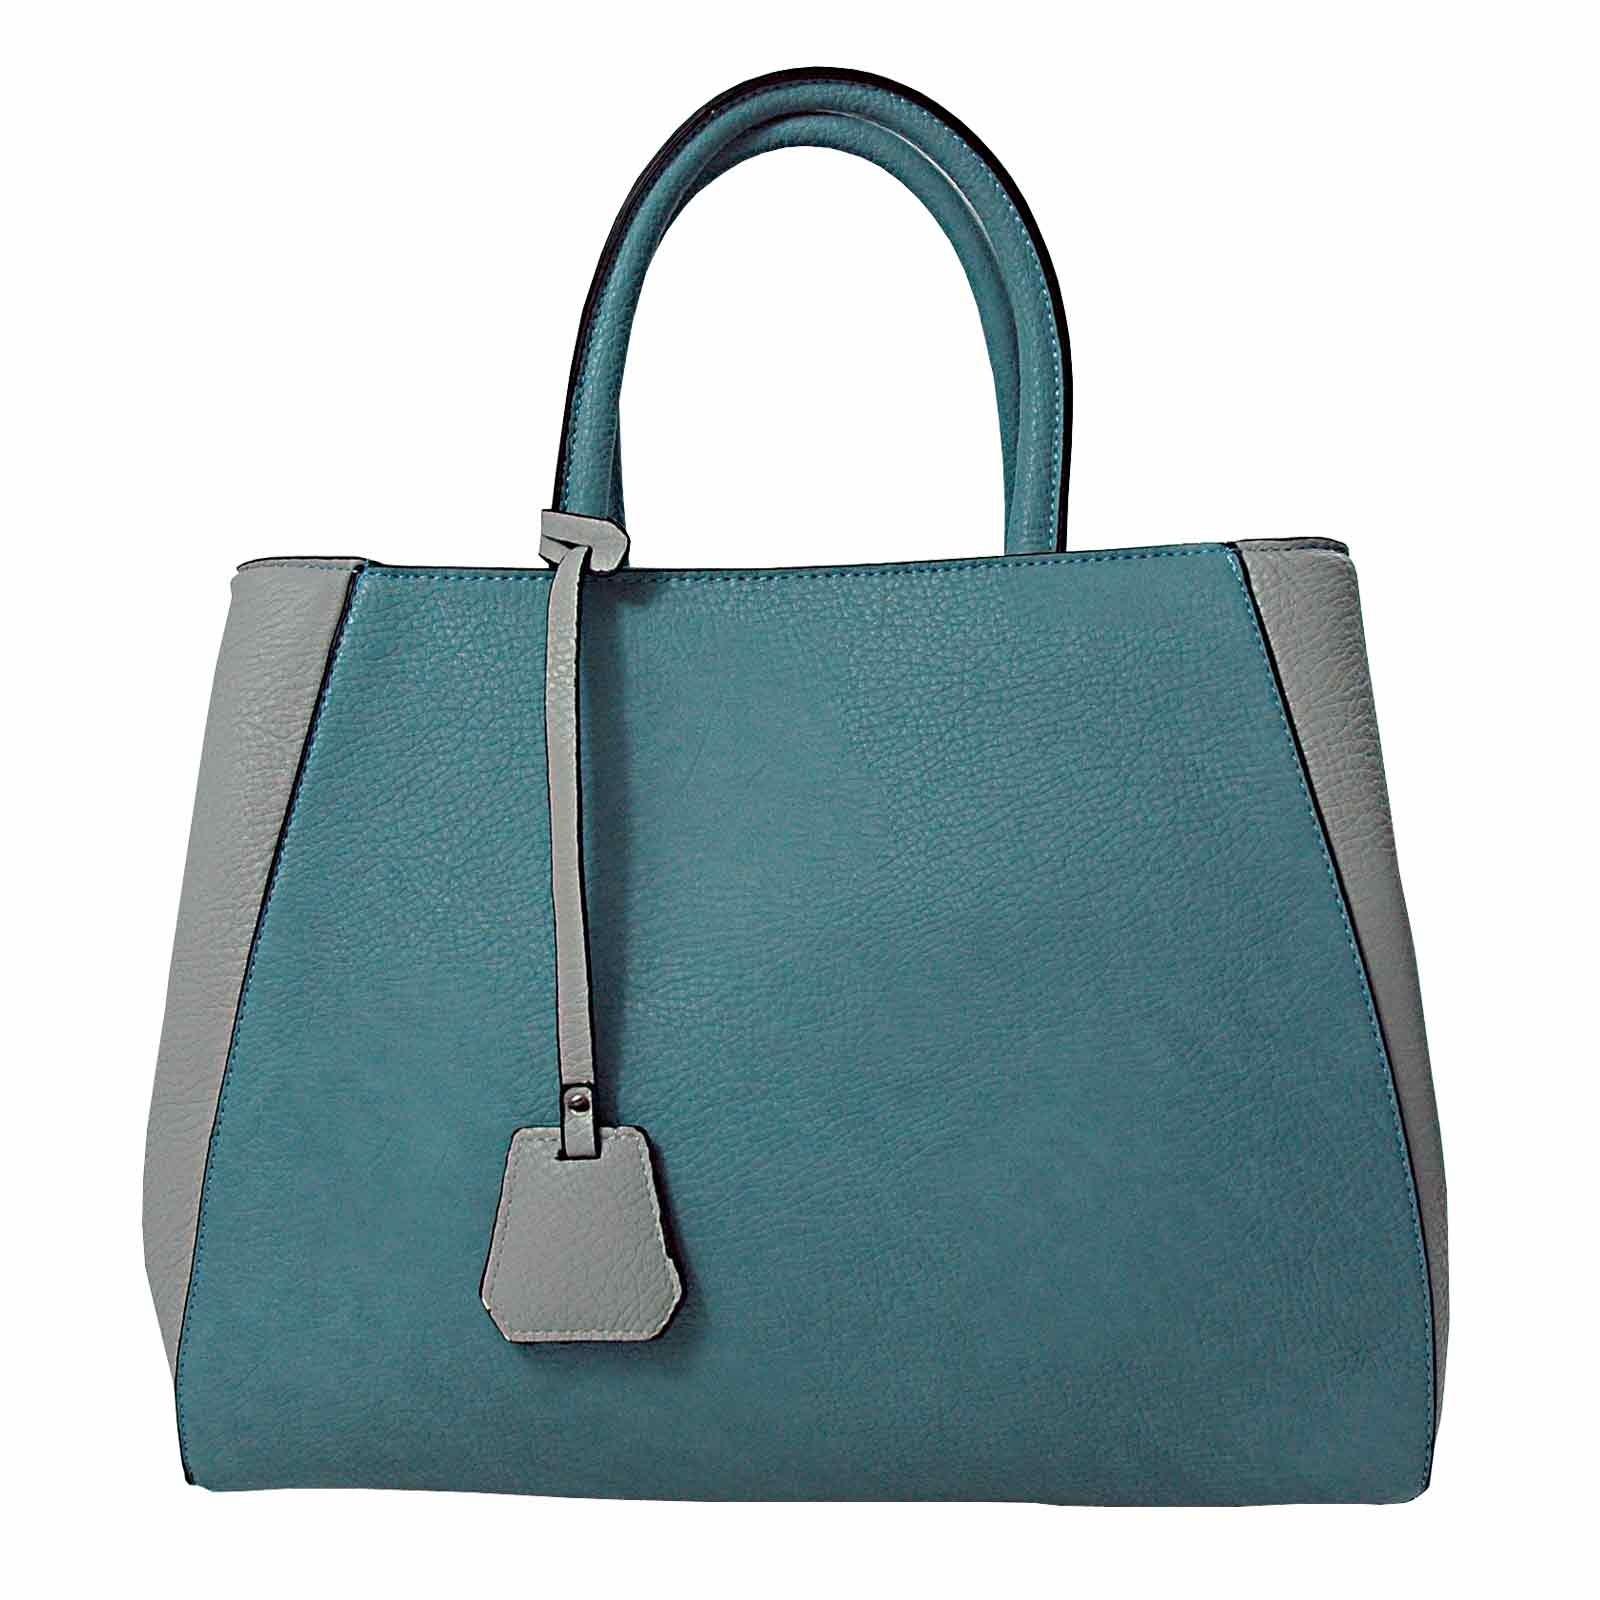 A-Zone Damentasche hellgrau-taubenblau mit Ledernarbung